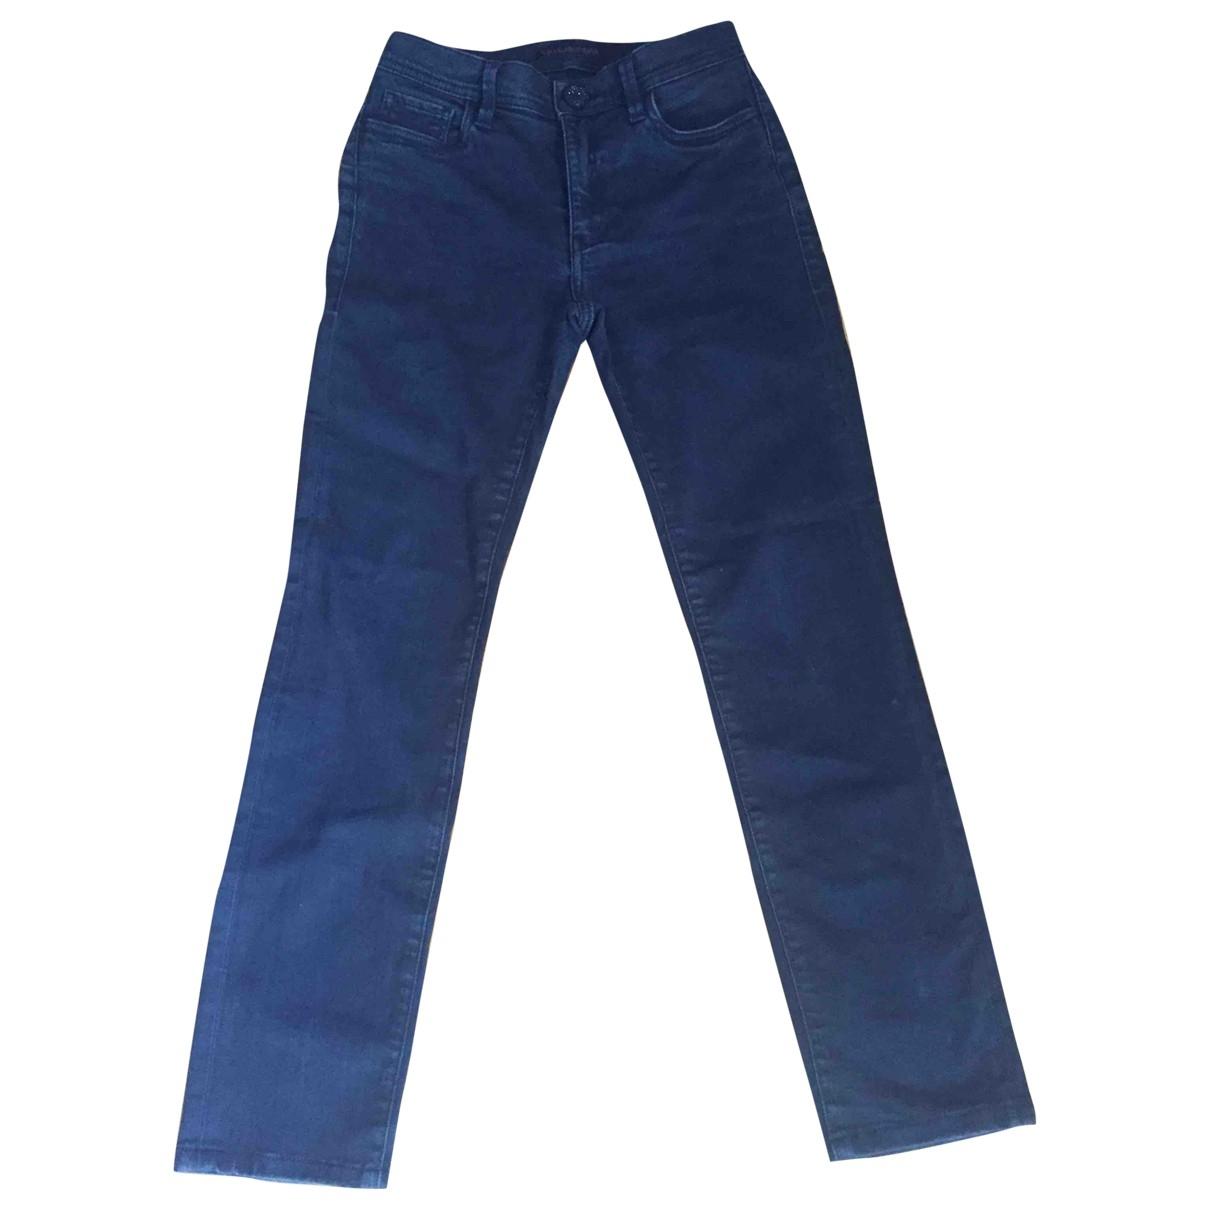 Trussardi Jeans \N Black Cotton - elasthane Jeans for Women 35 FR